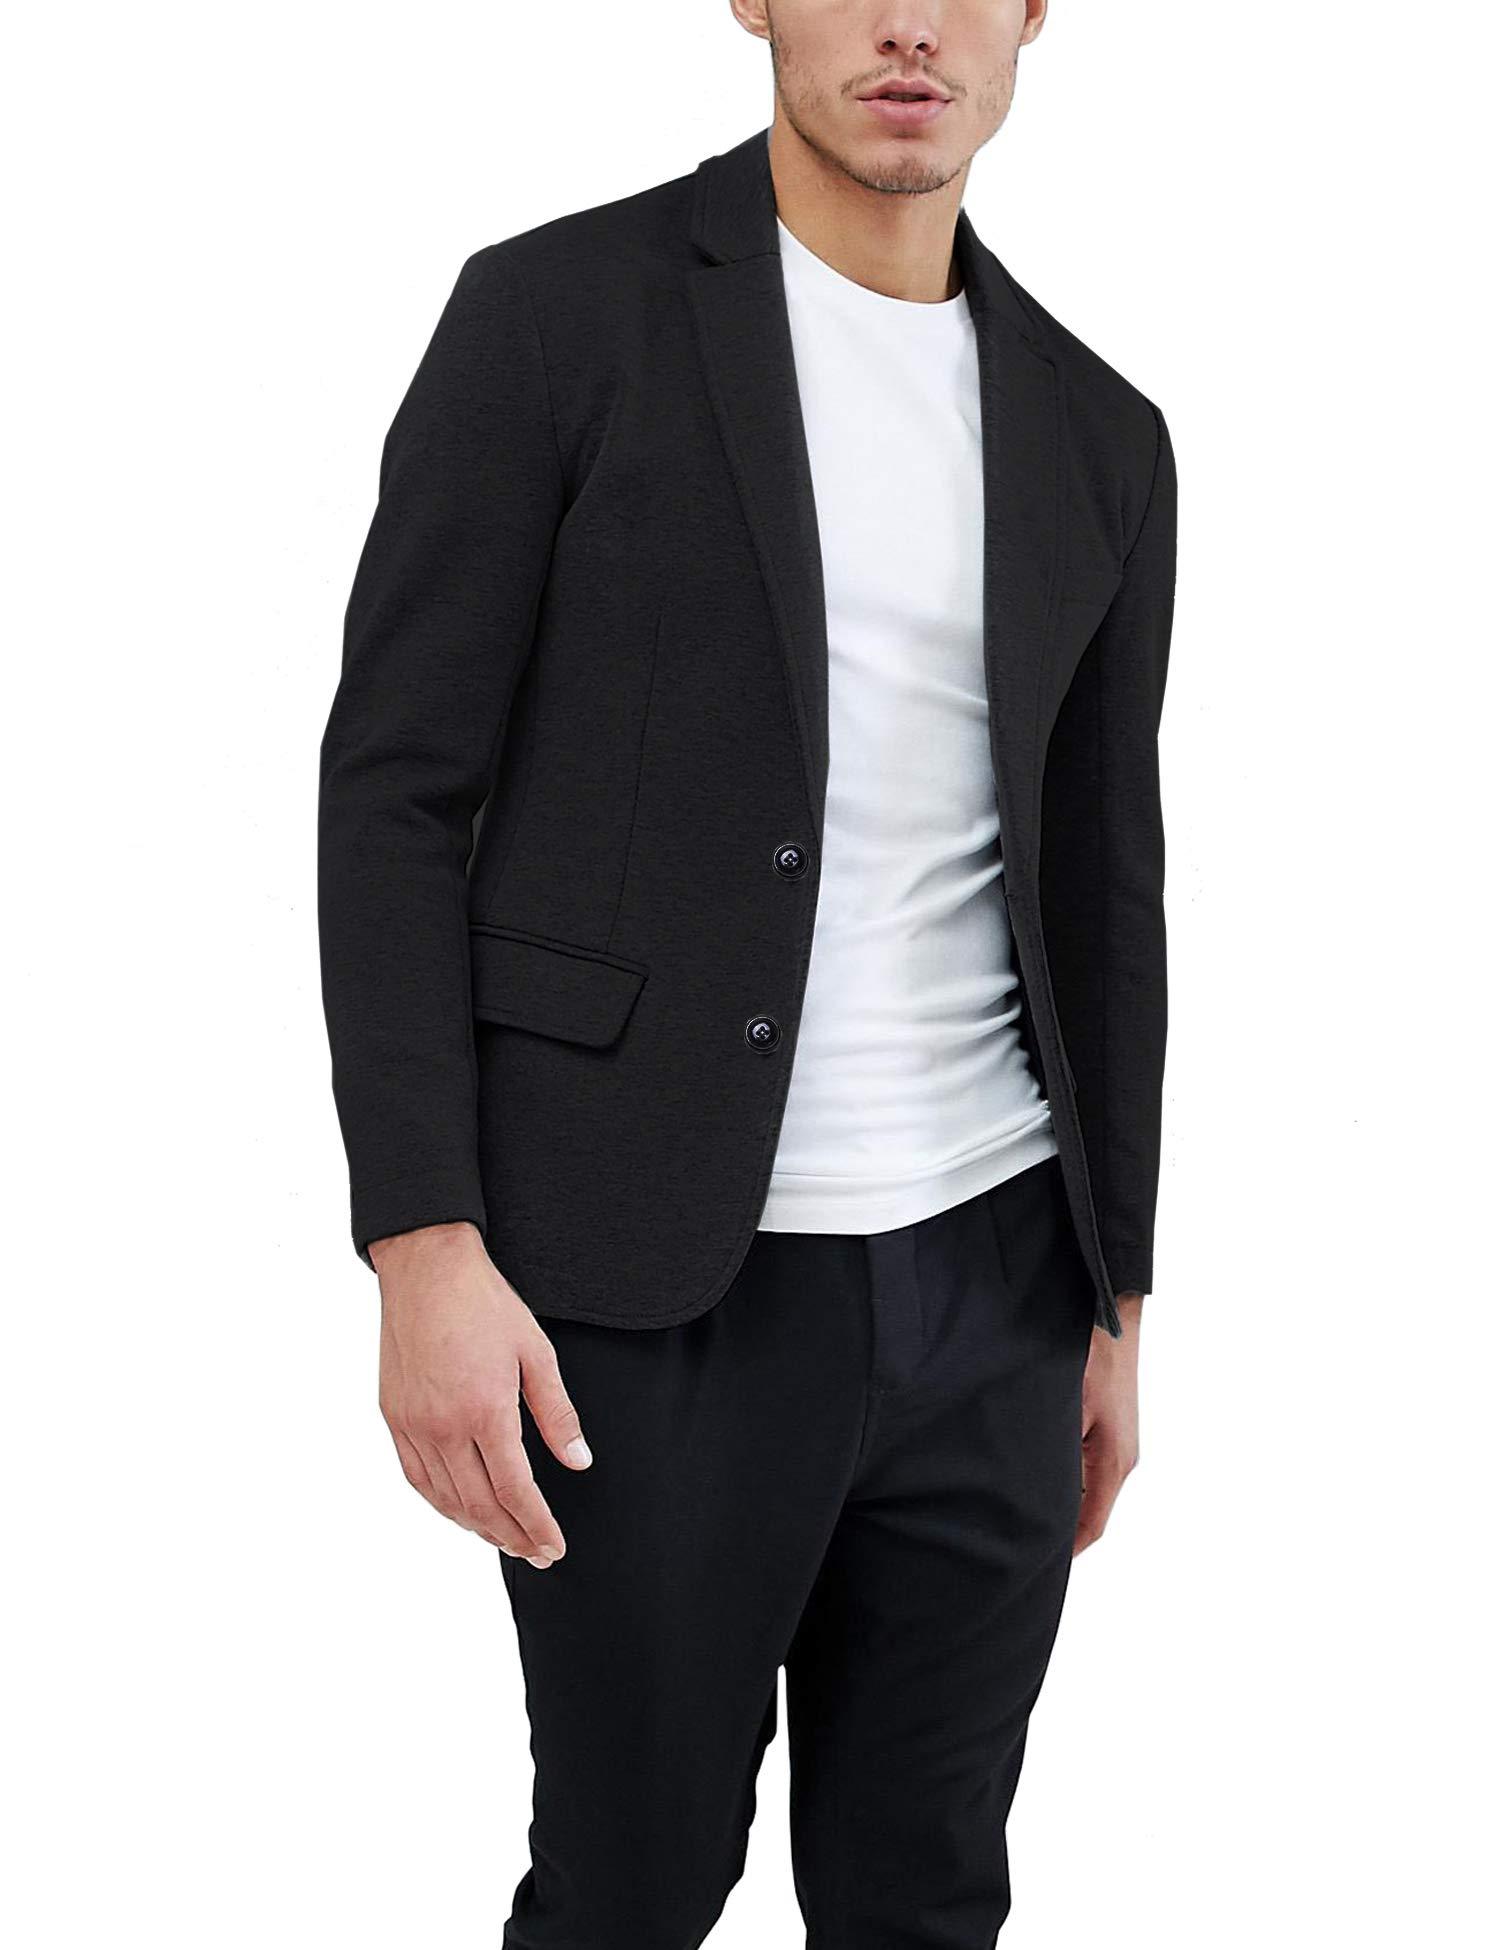 Daupanzees Mens Casual Two Button Suits Lapel Blazer Jacket Lightweight Sport Coat